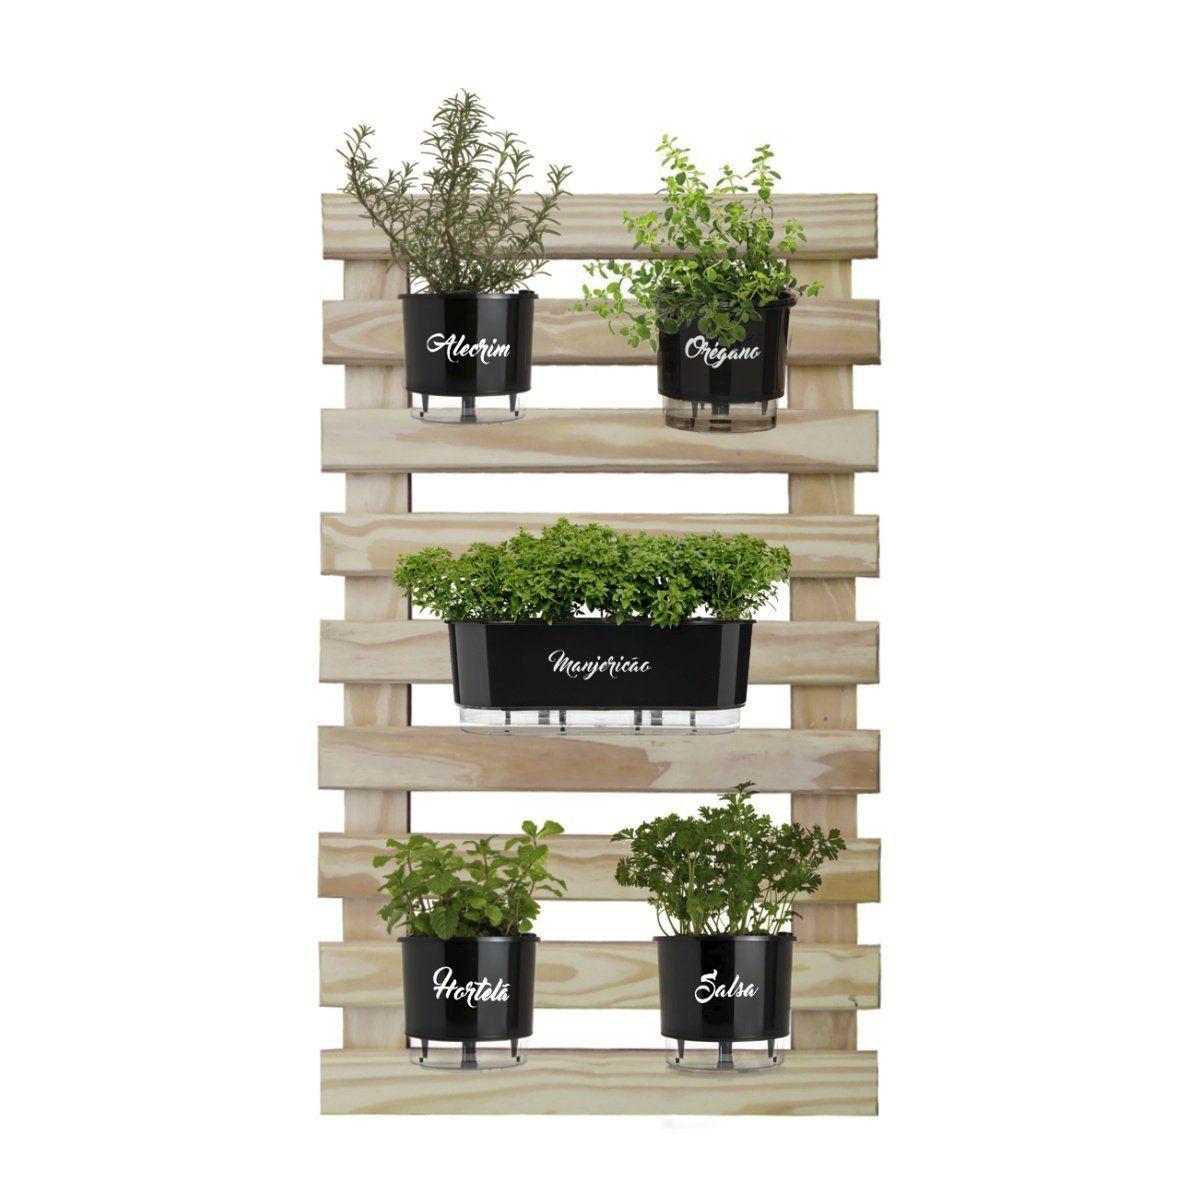 Kit Horta Vertical Gourmet 100cm x 60cm Completa